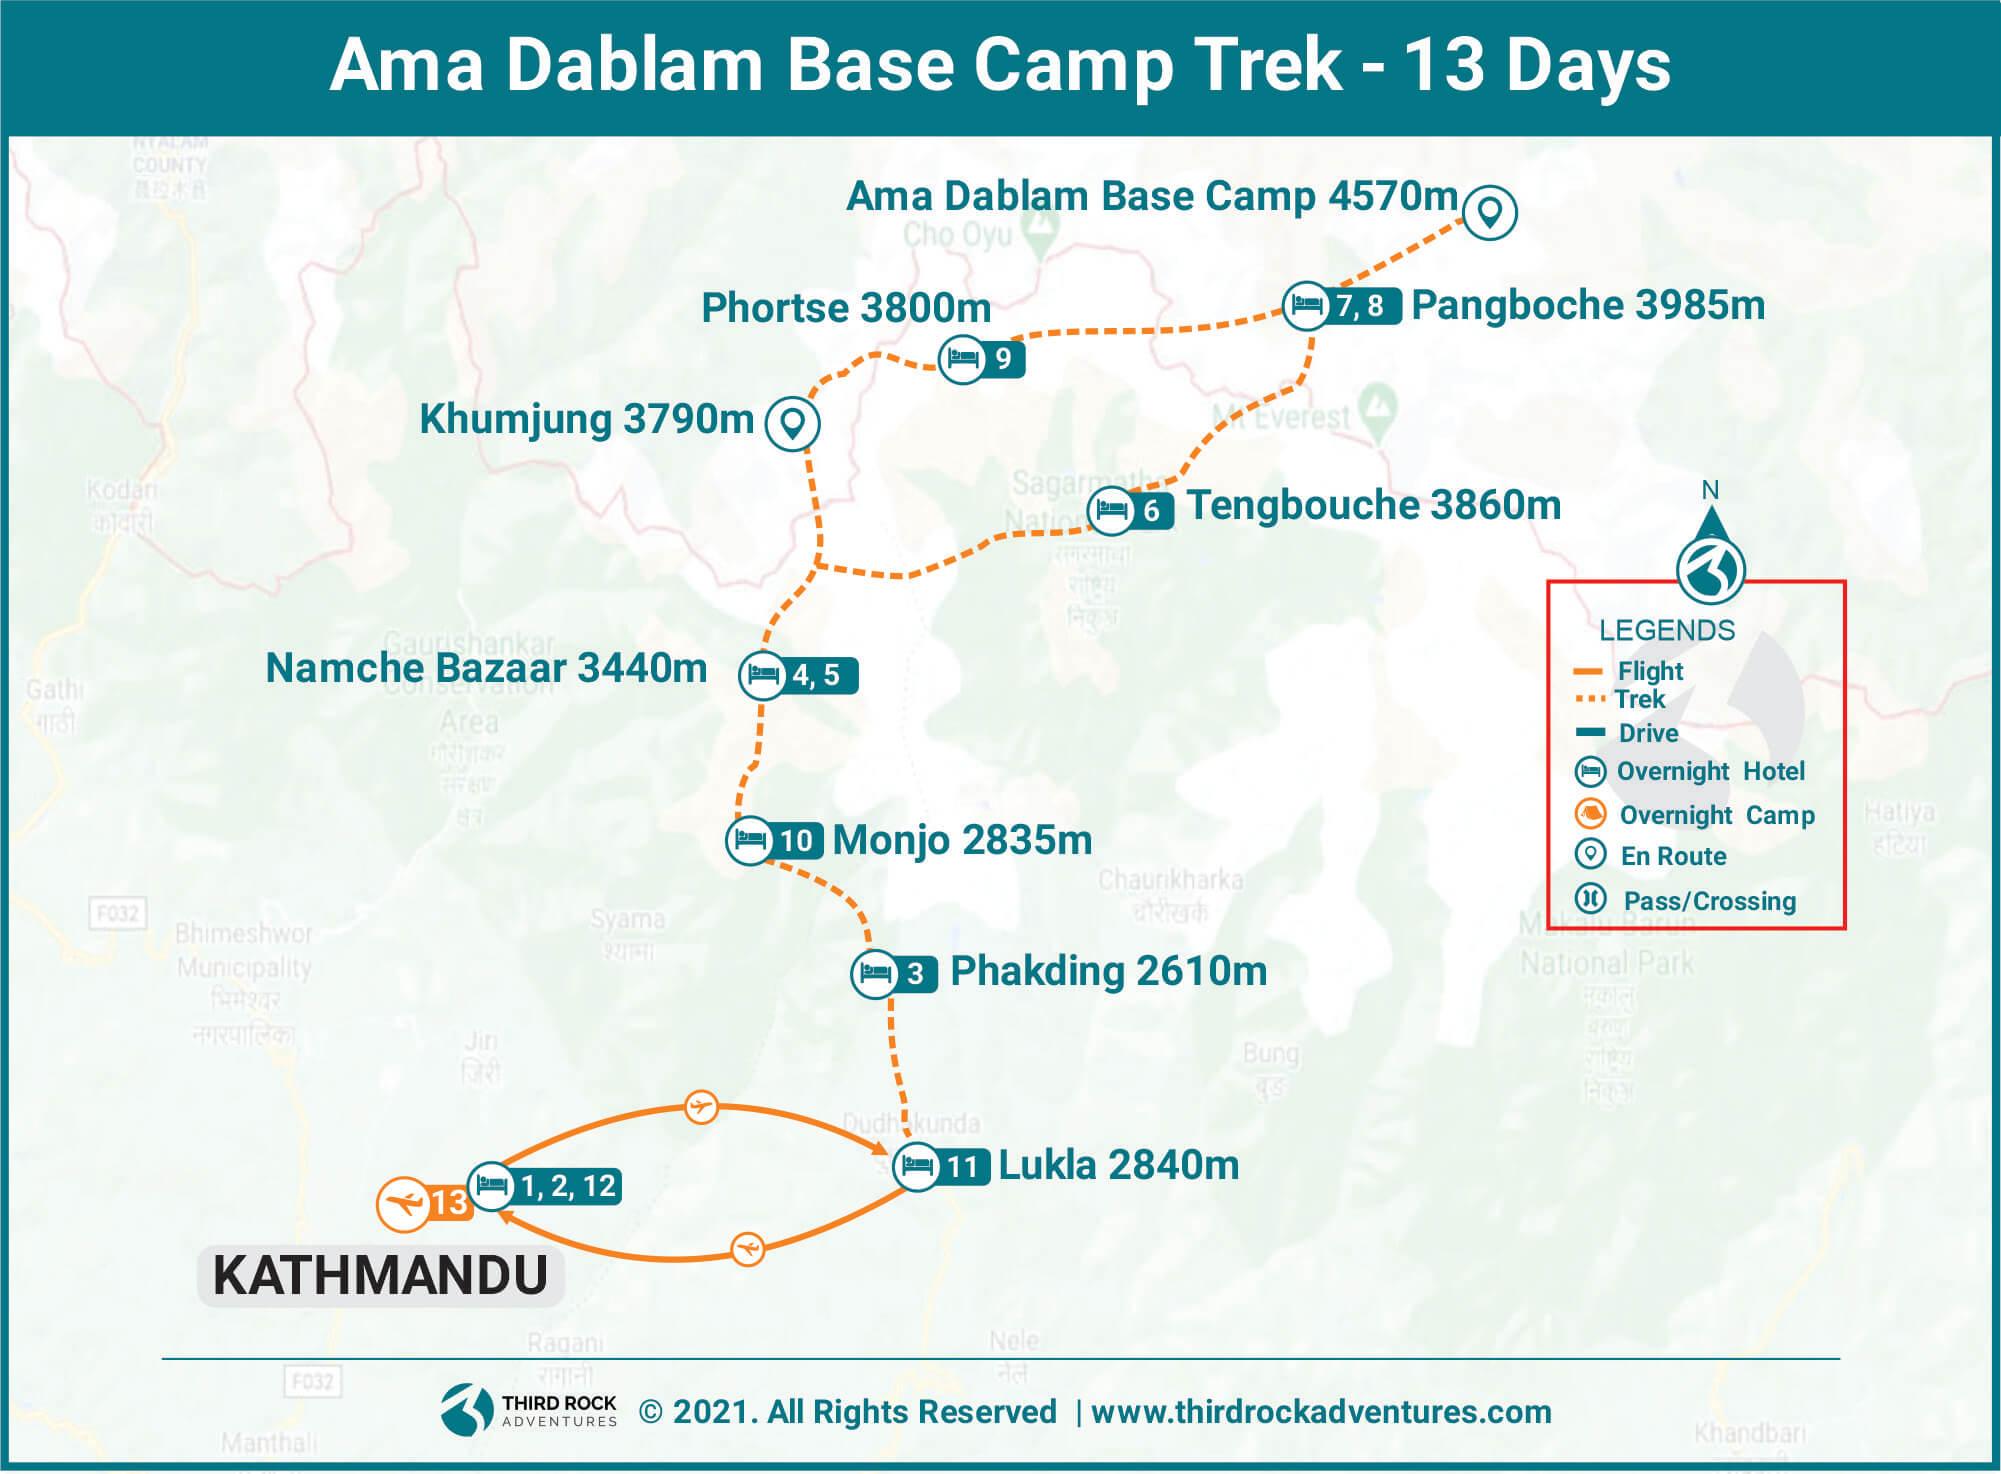 Ama Dablam Base Camp Trek Route Map